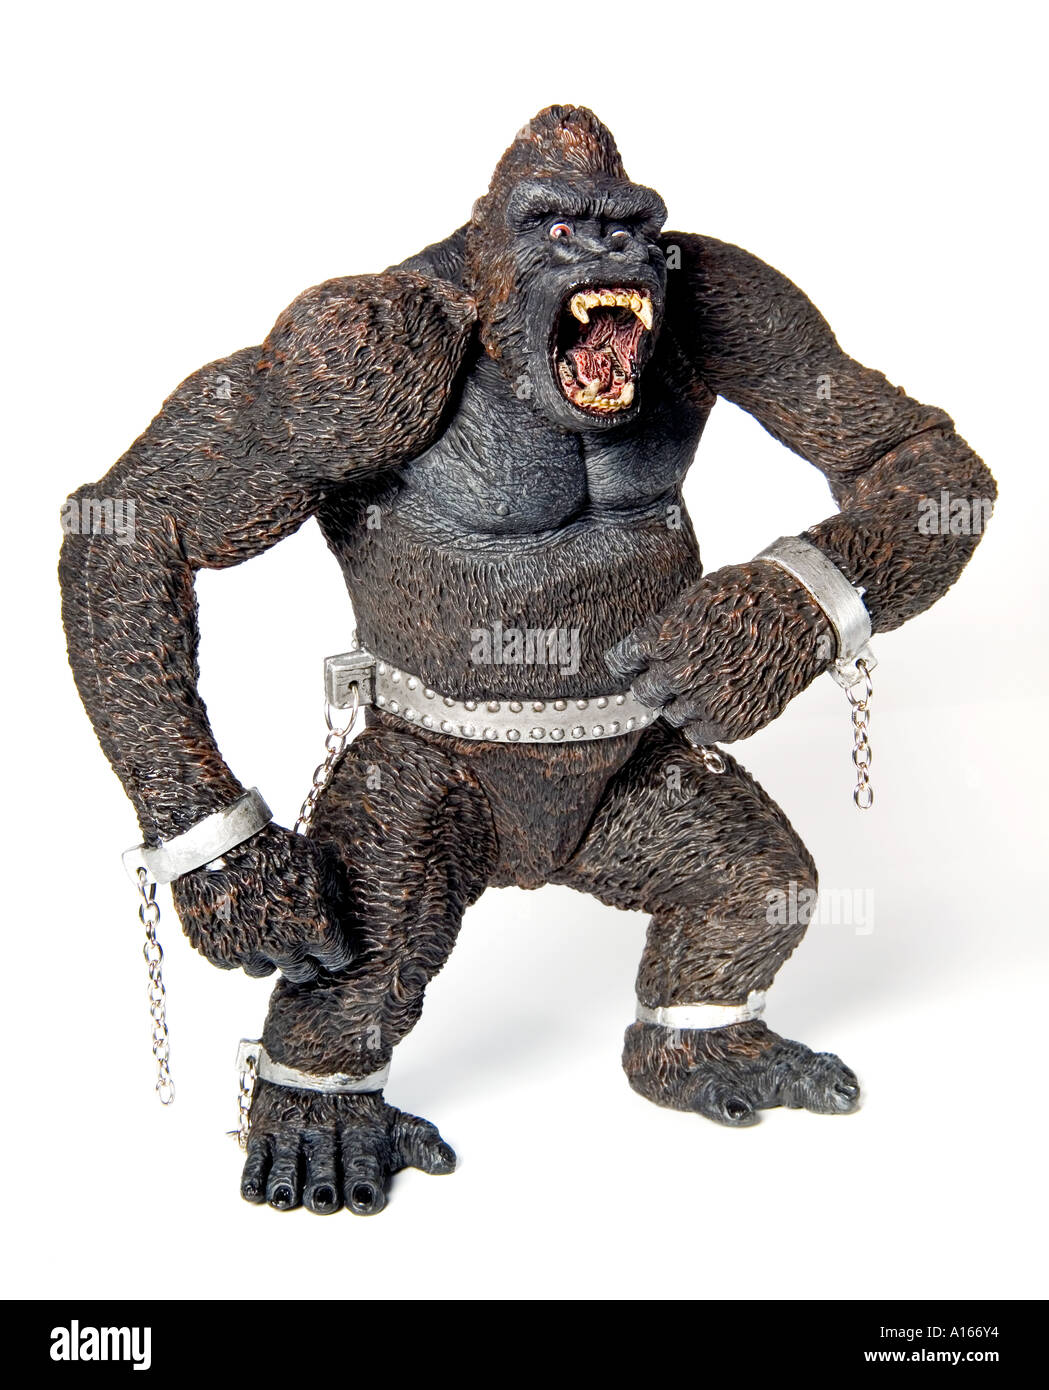 King Kong Toy - Stock Image